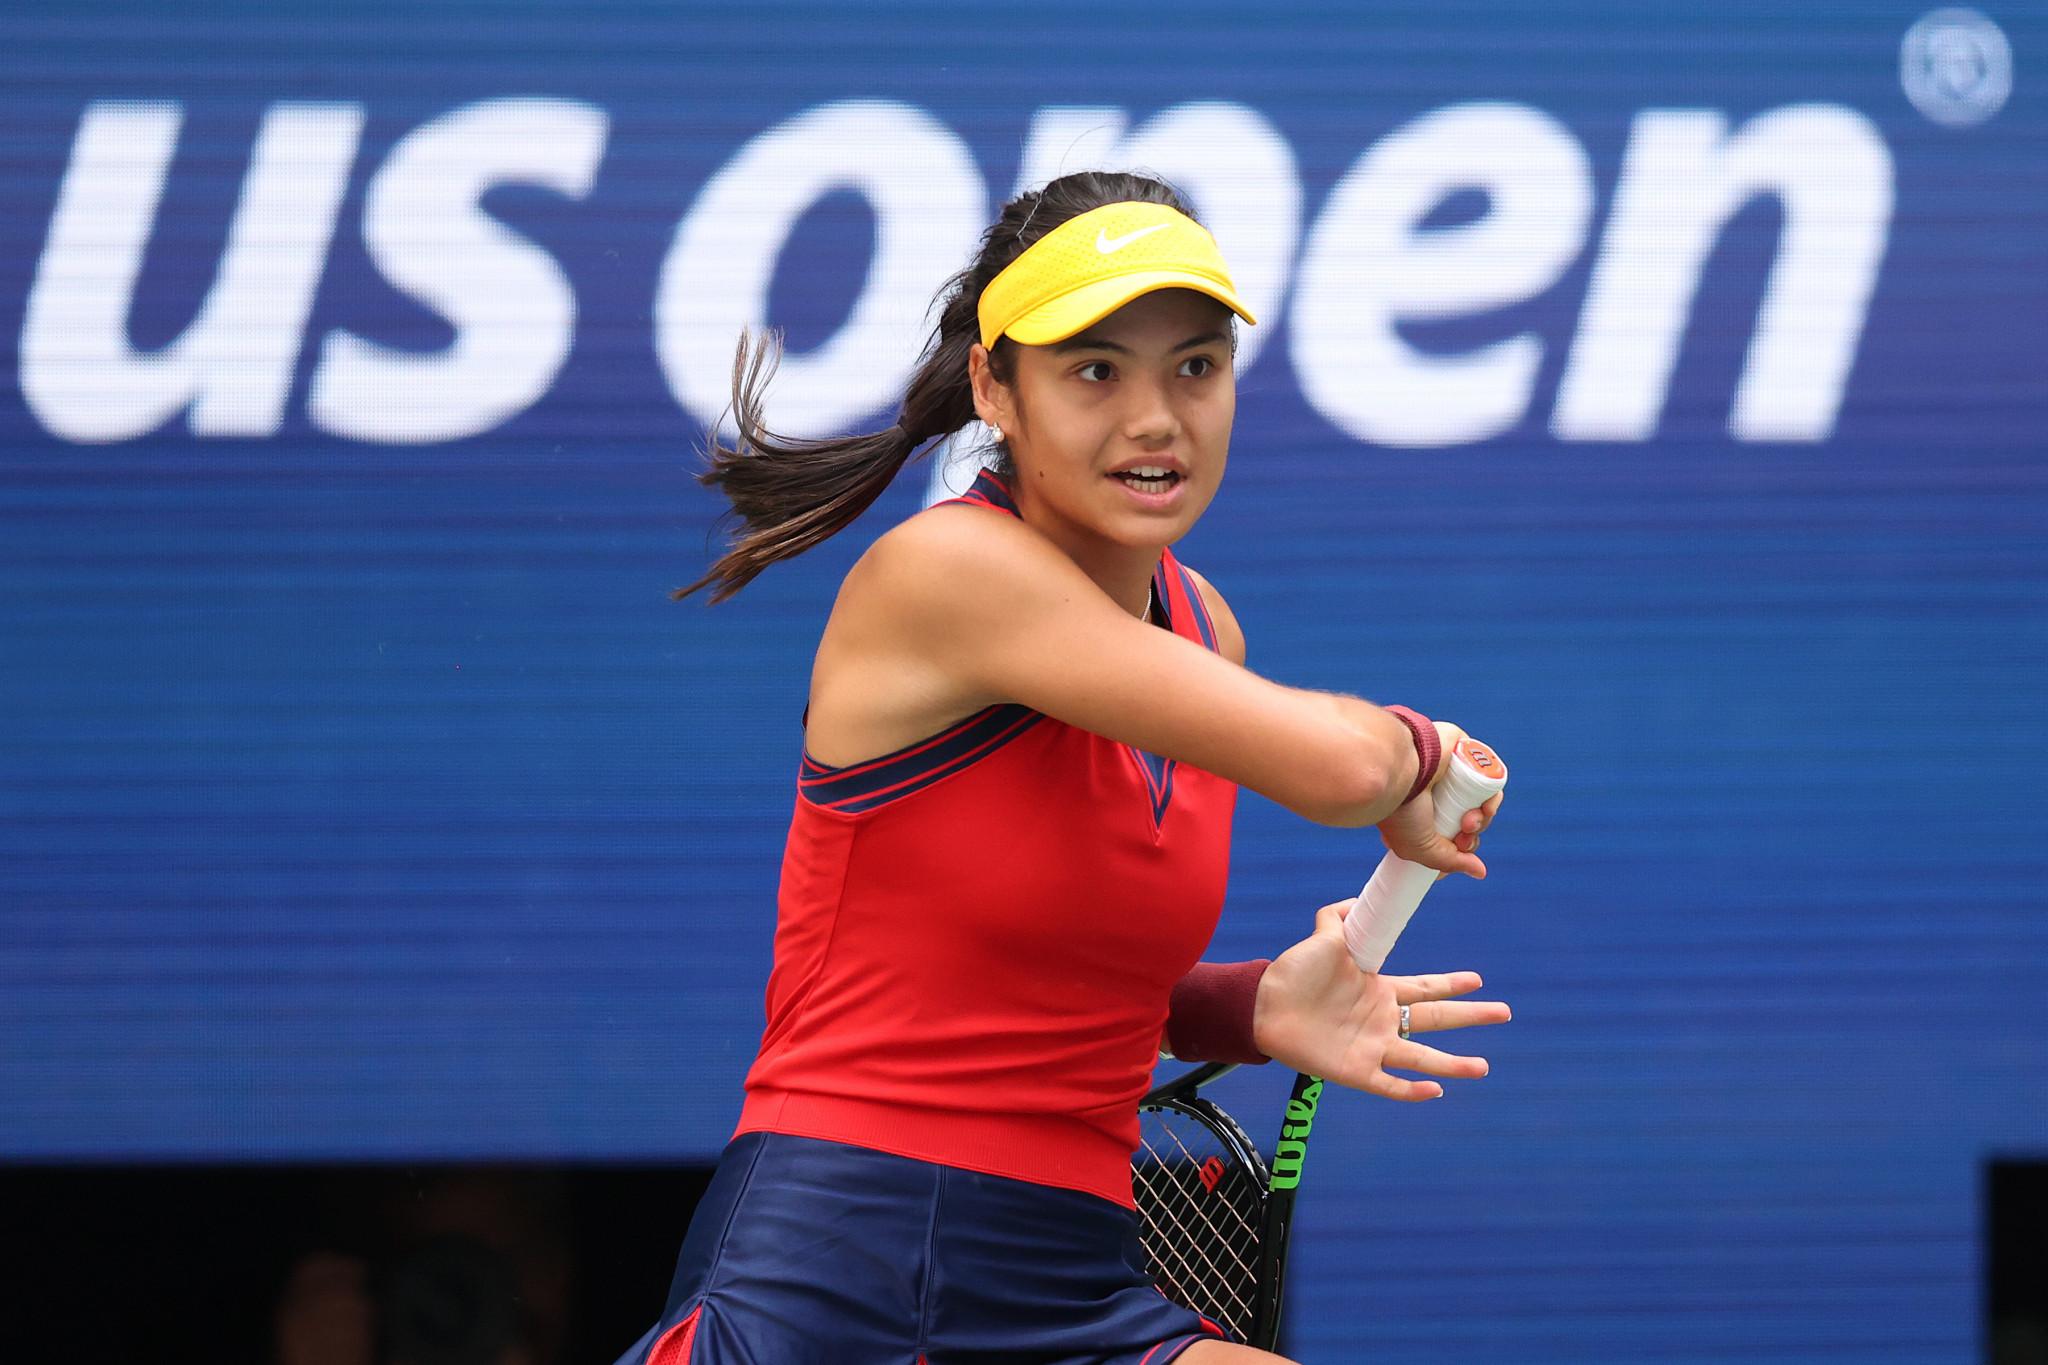 Qualifier Raducanu roars past Rogers to reach US Open quarter-finals